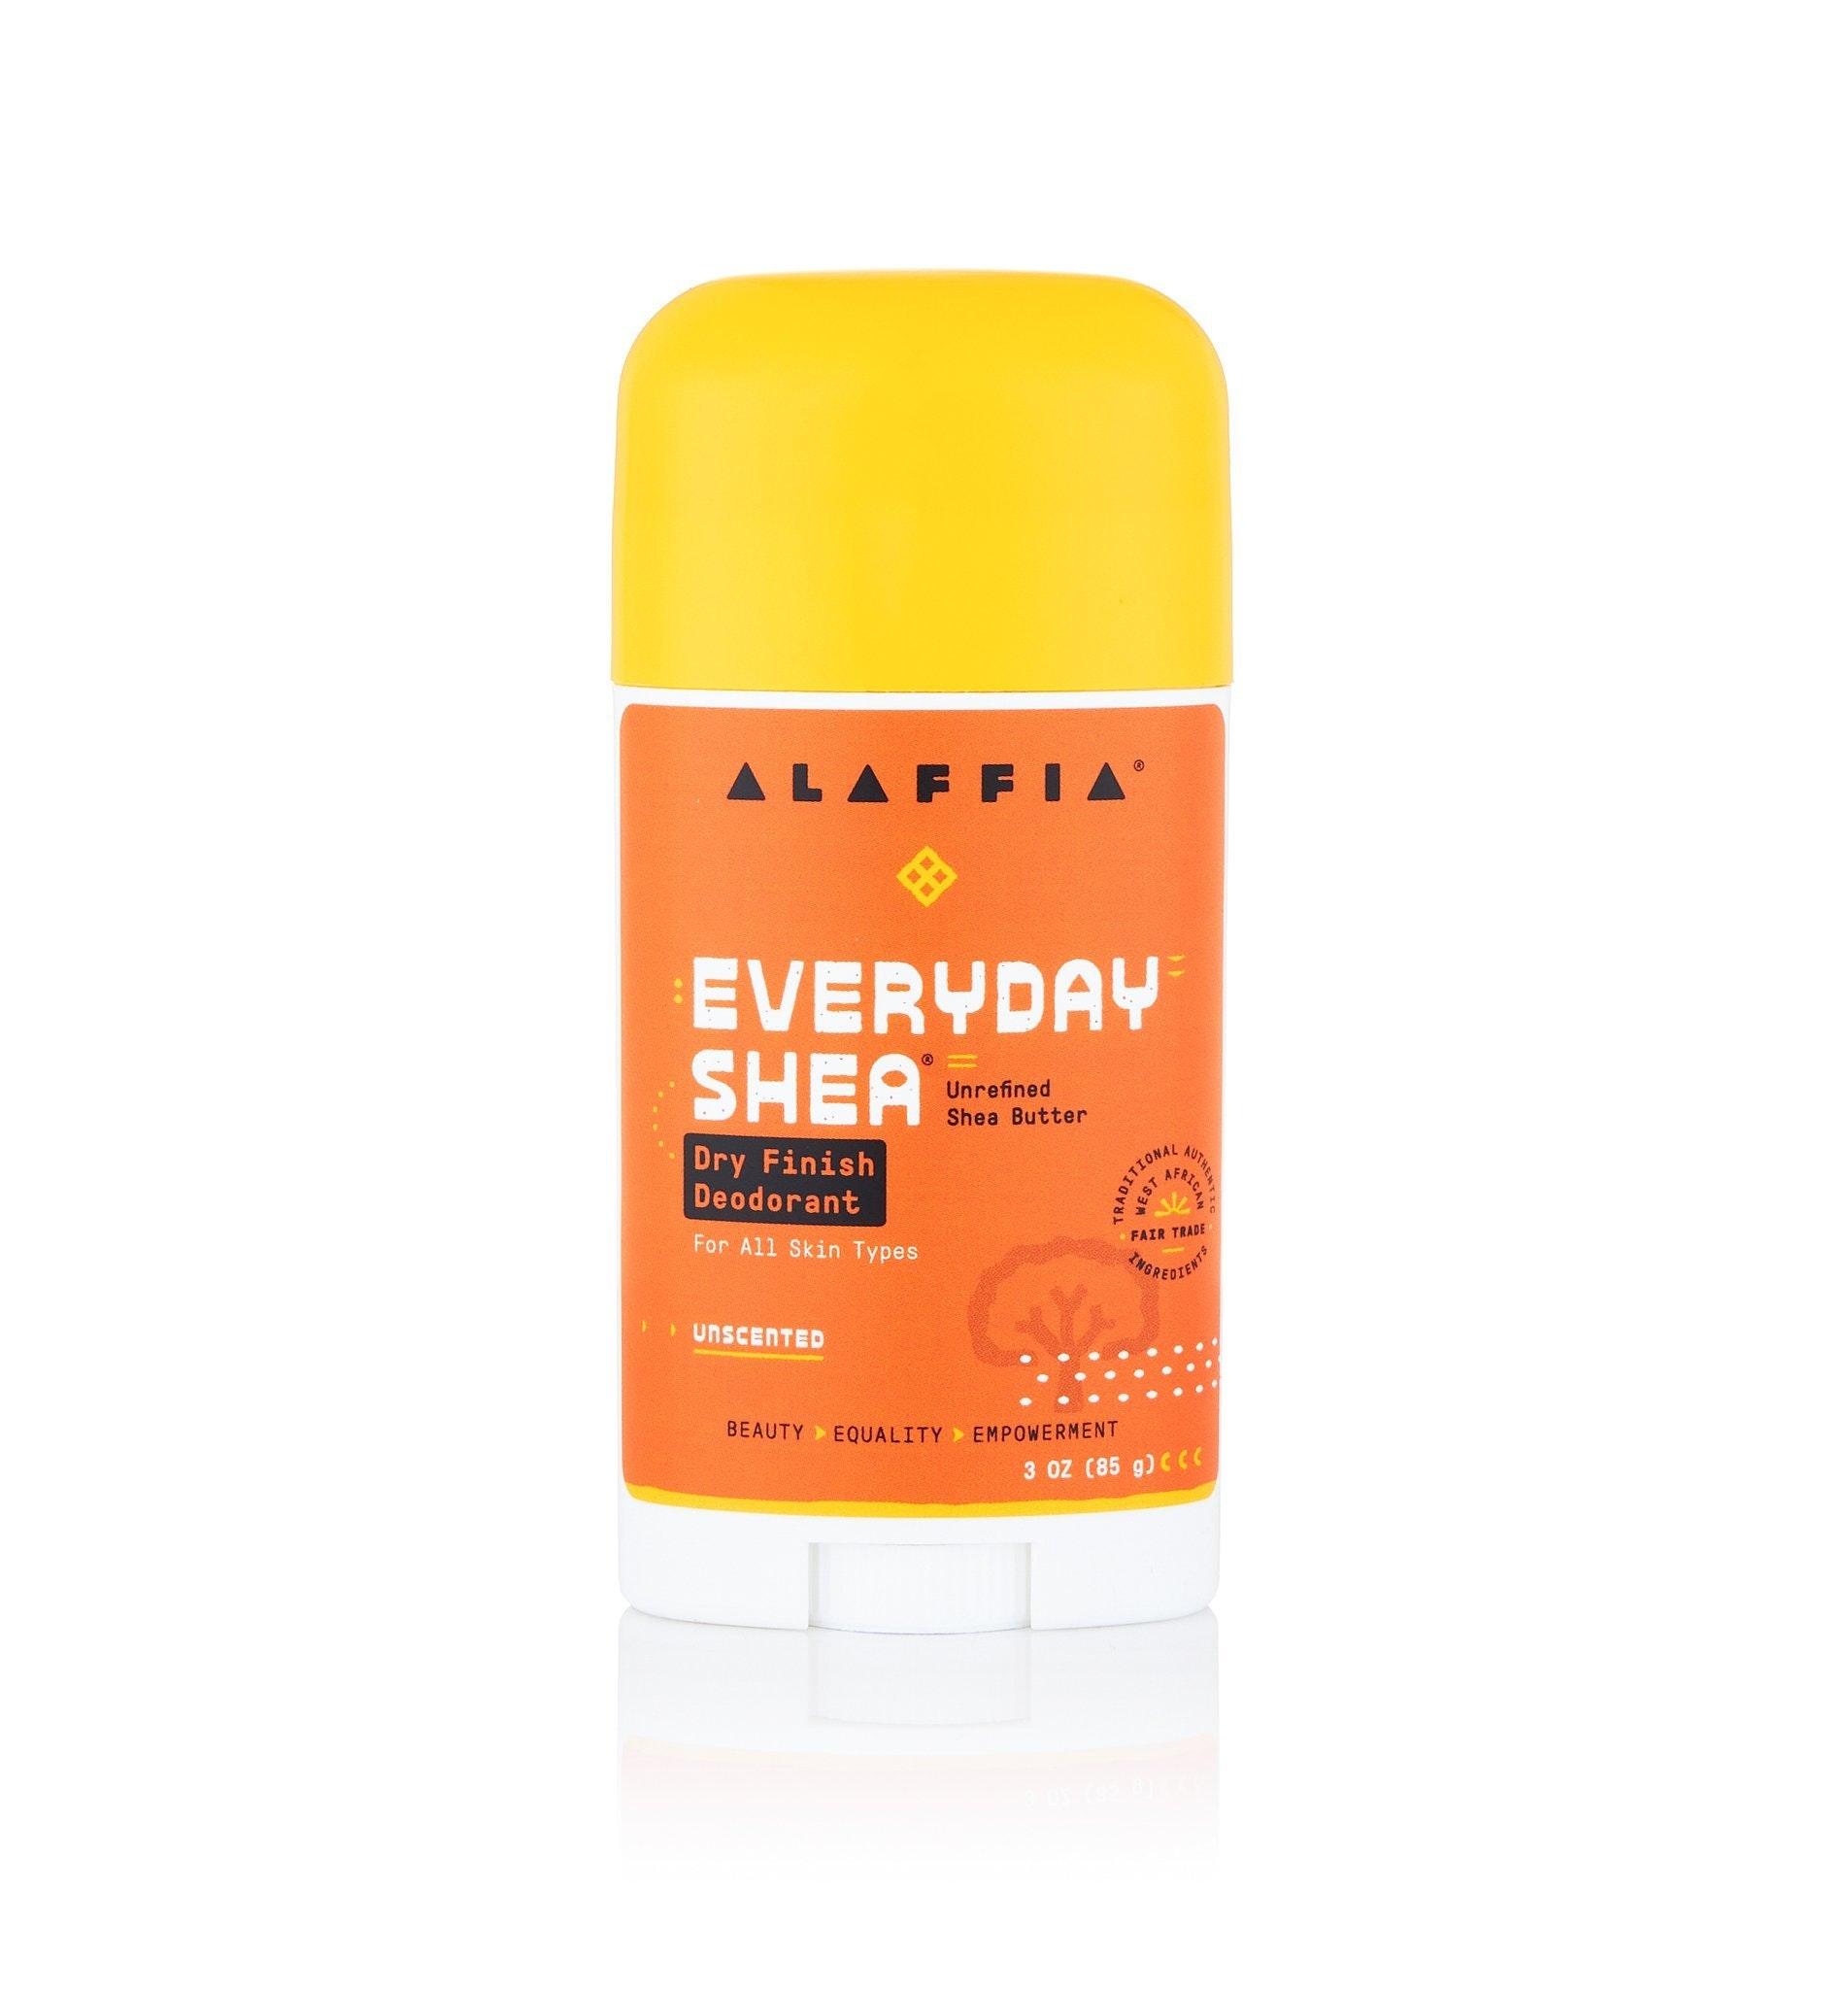 Alaffia Everyday Shea Deodorant